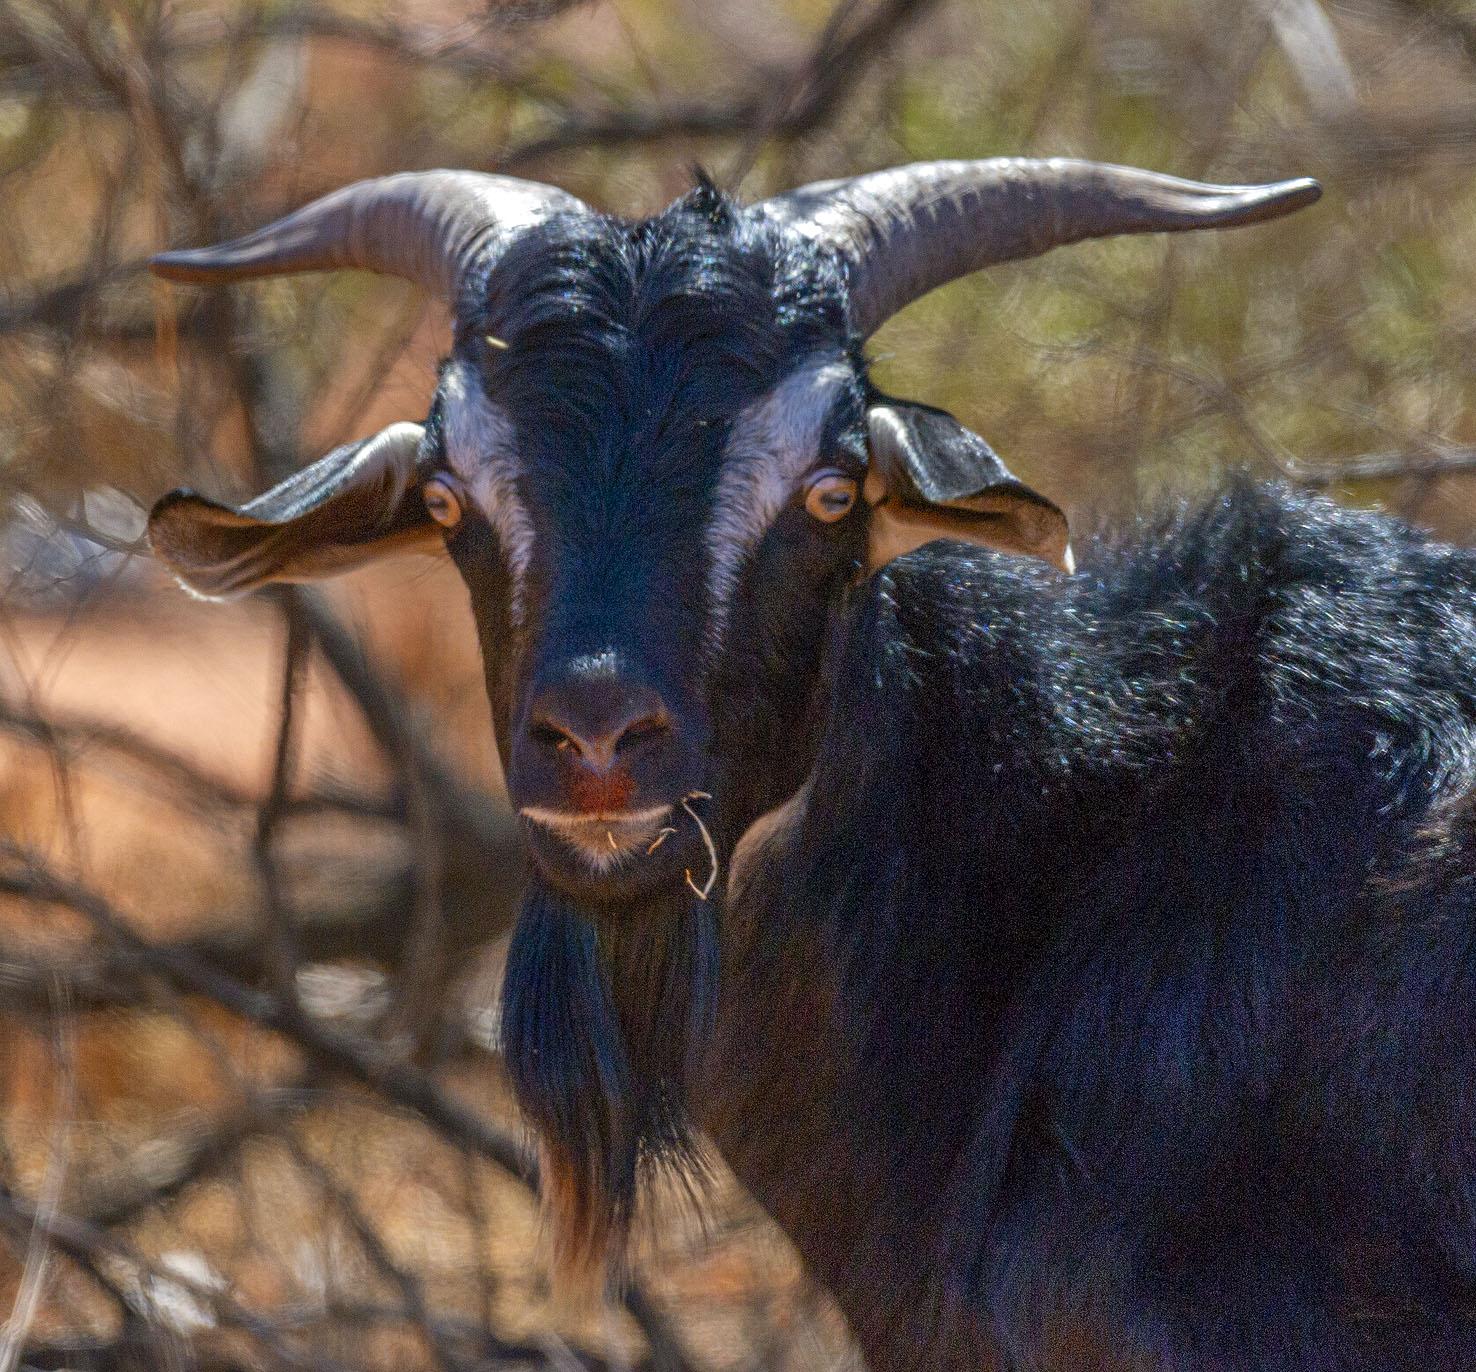 Goat _6580